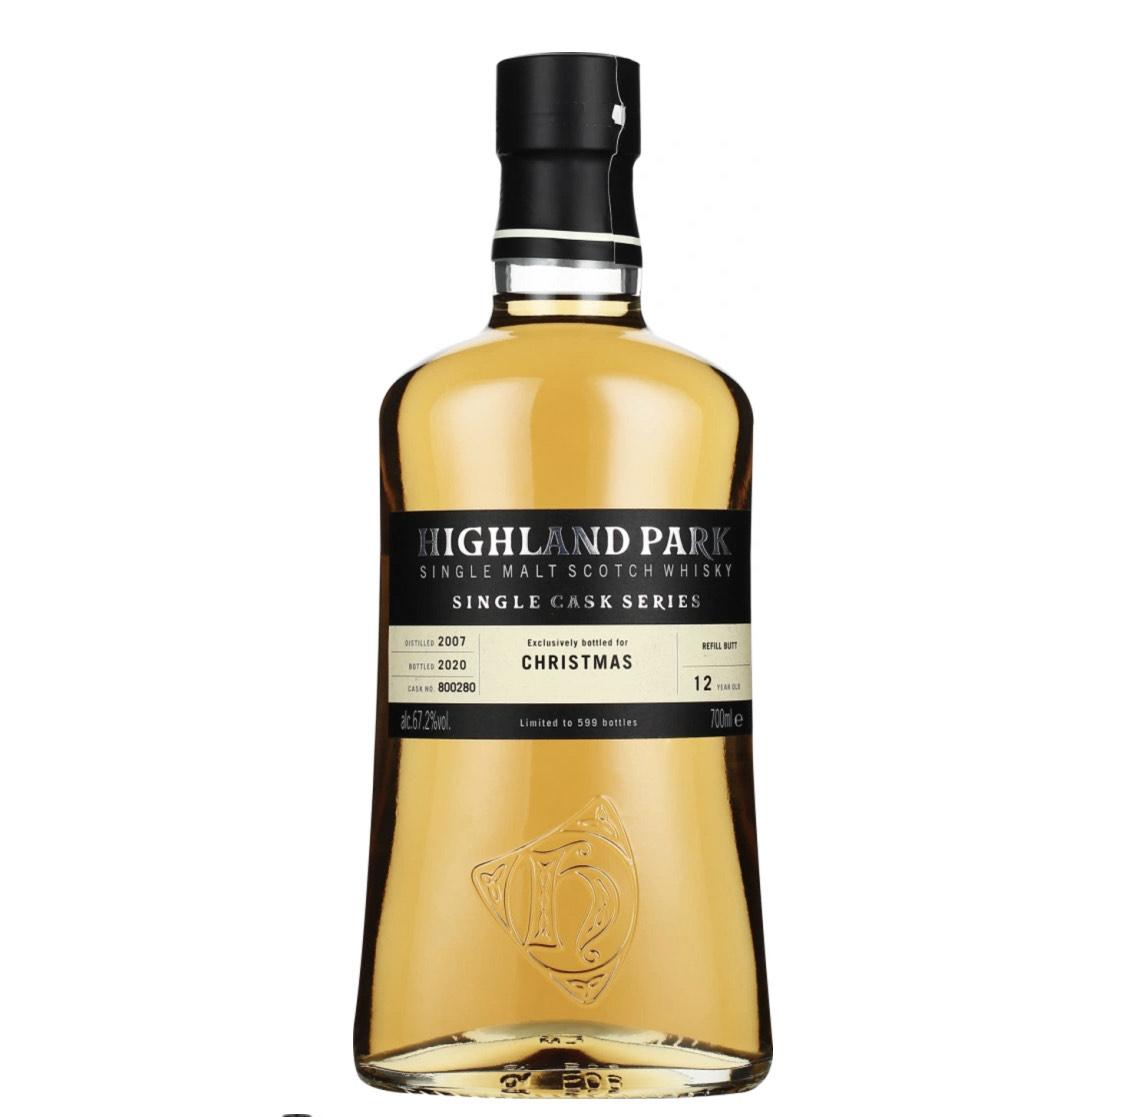 Highland Park 12 Jahre Single Cask Series Whisky (Christmas) 67,2%vol.